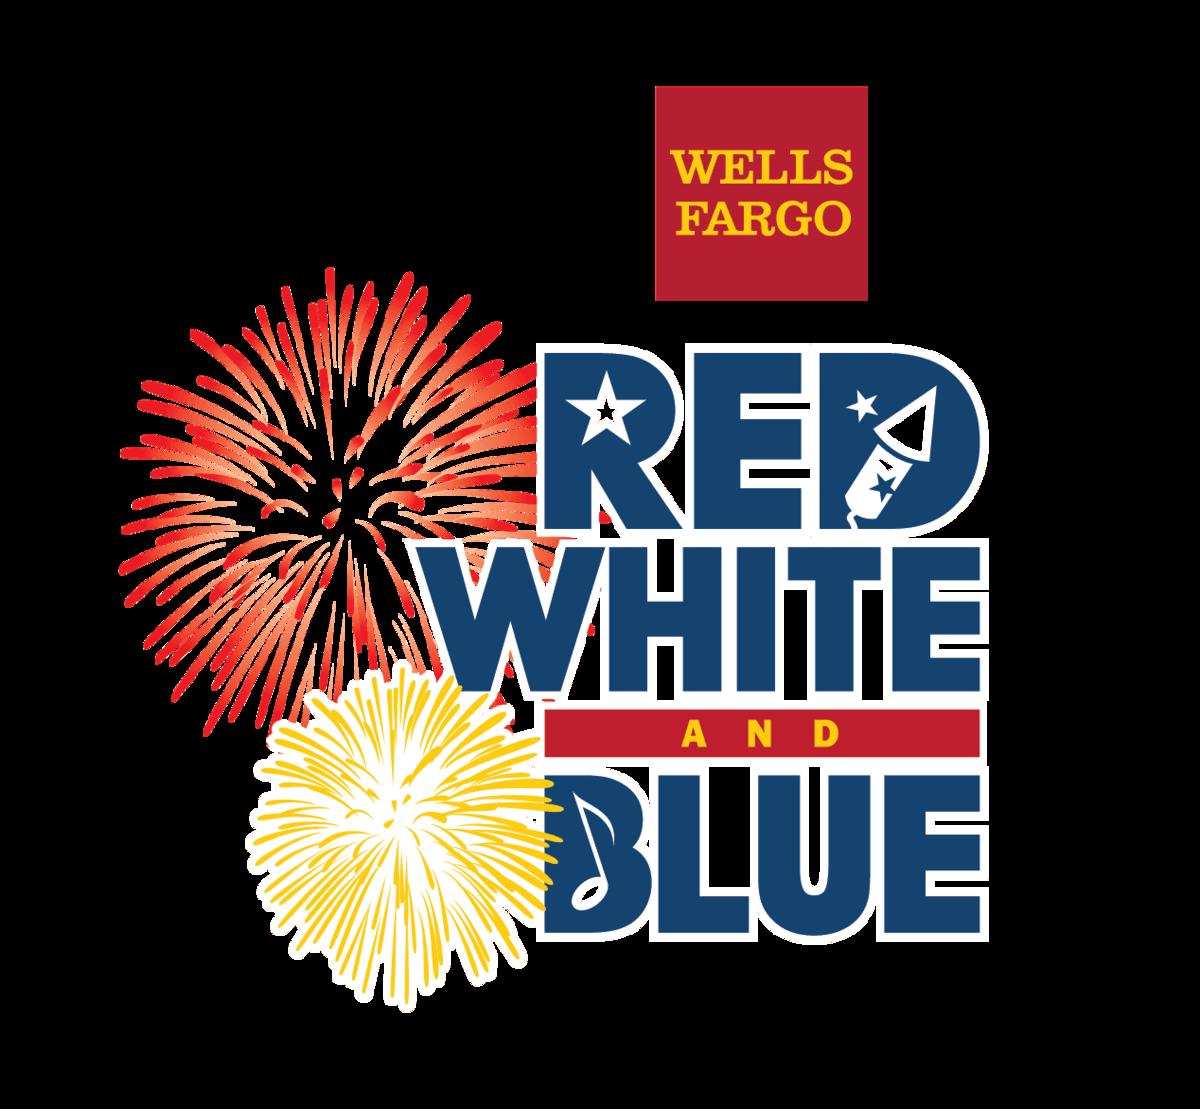 Wells Fargo Red, White & Blue